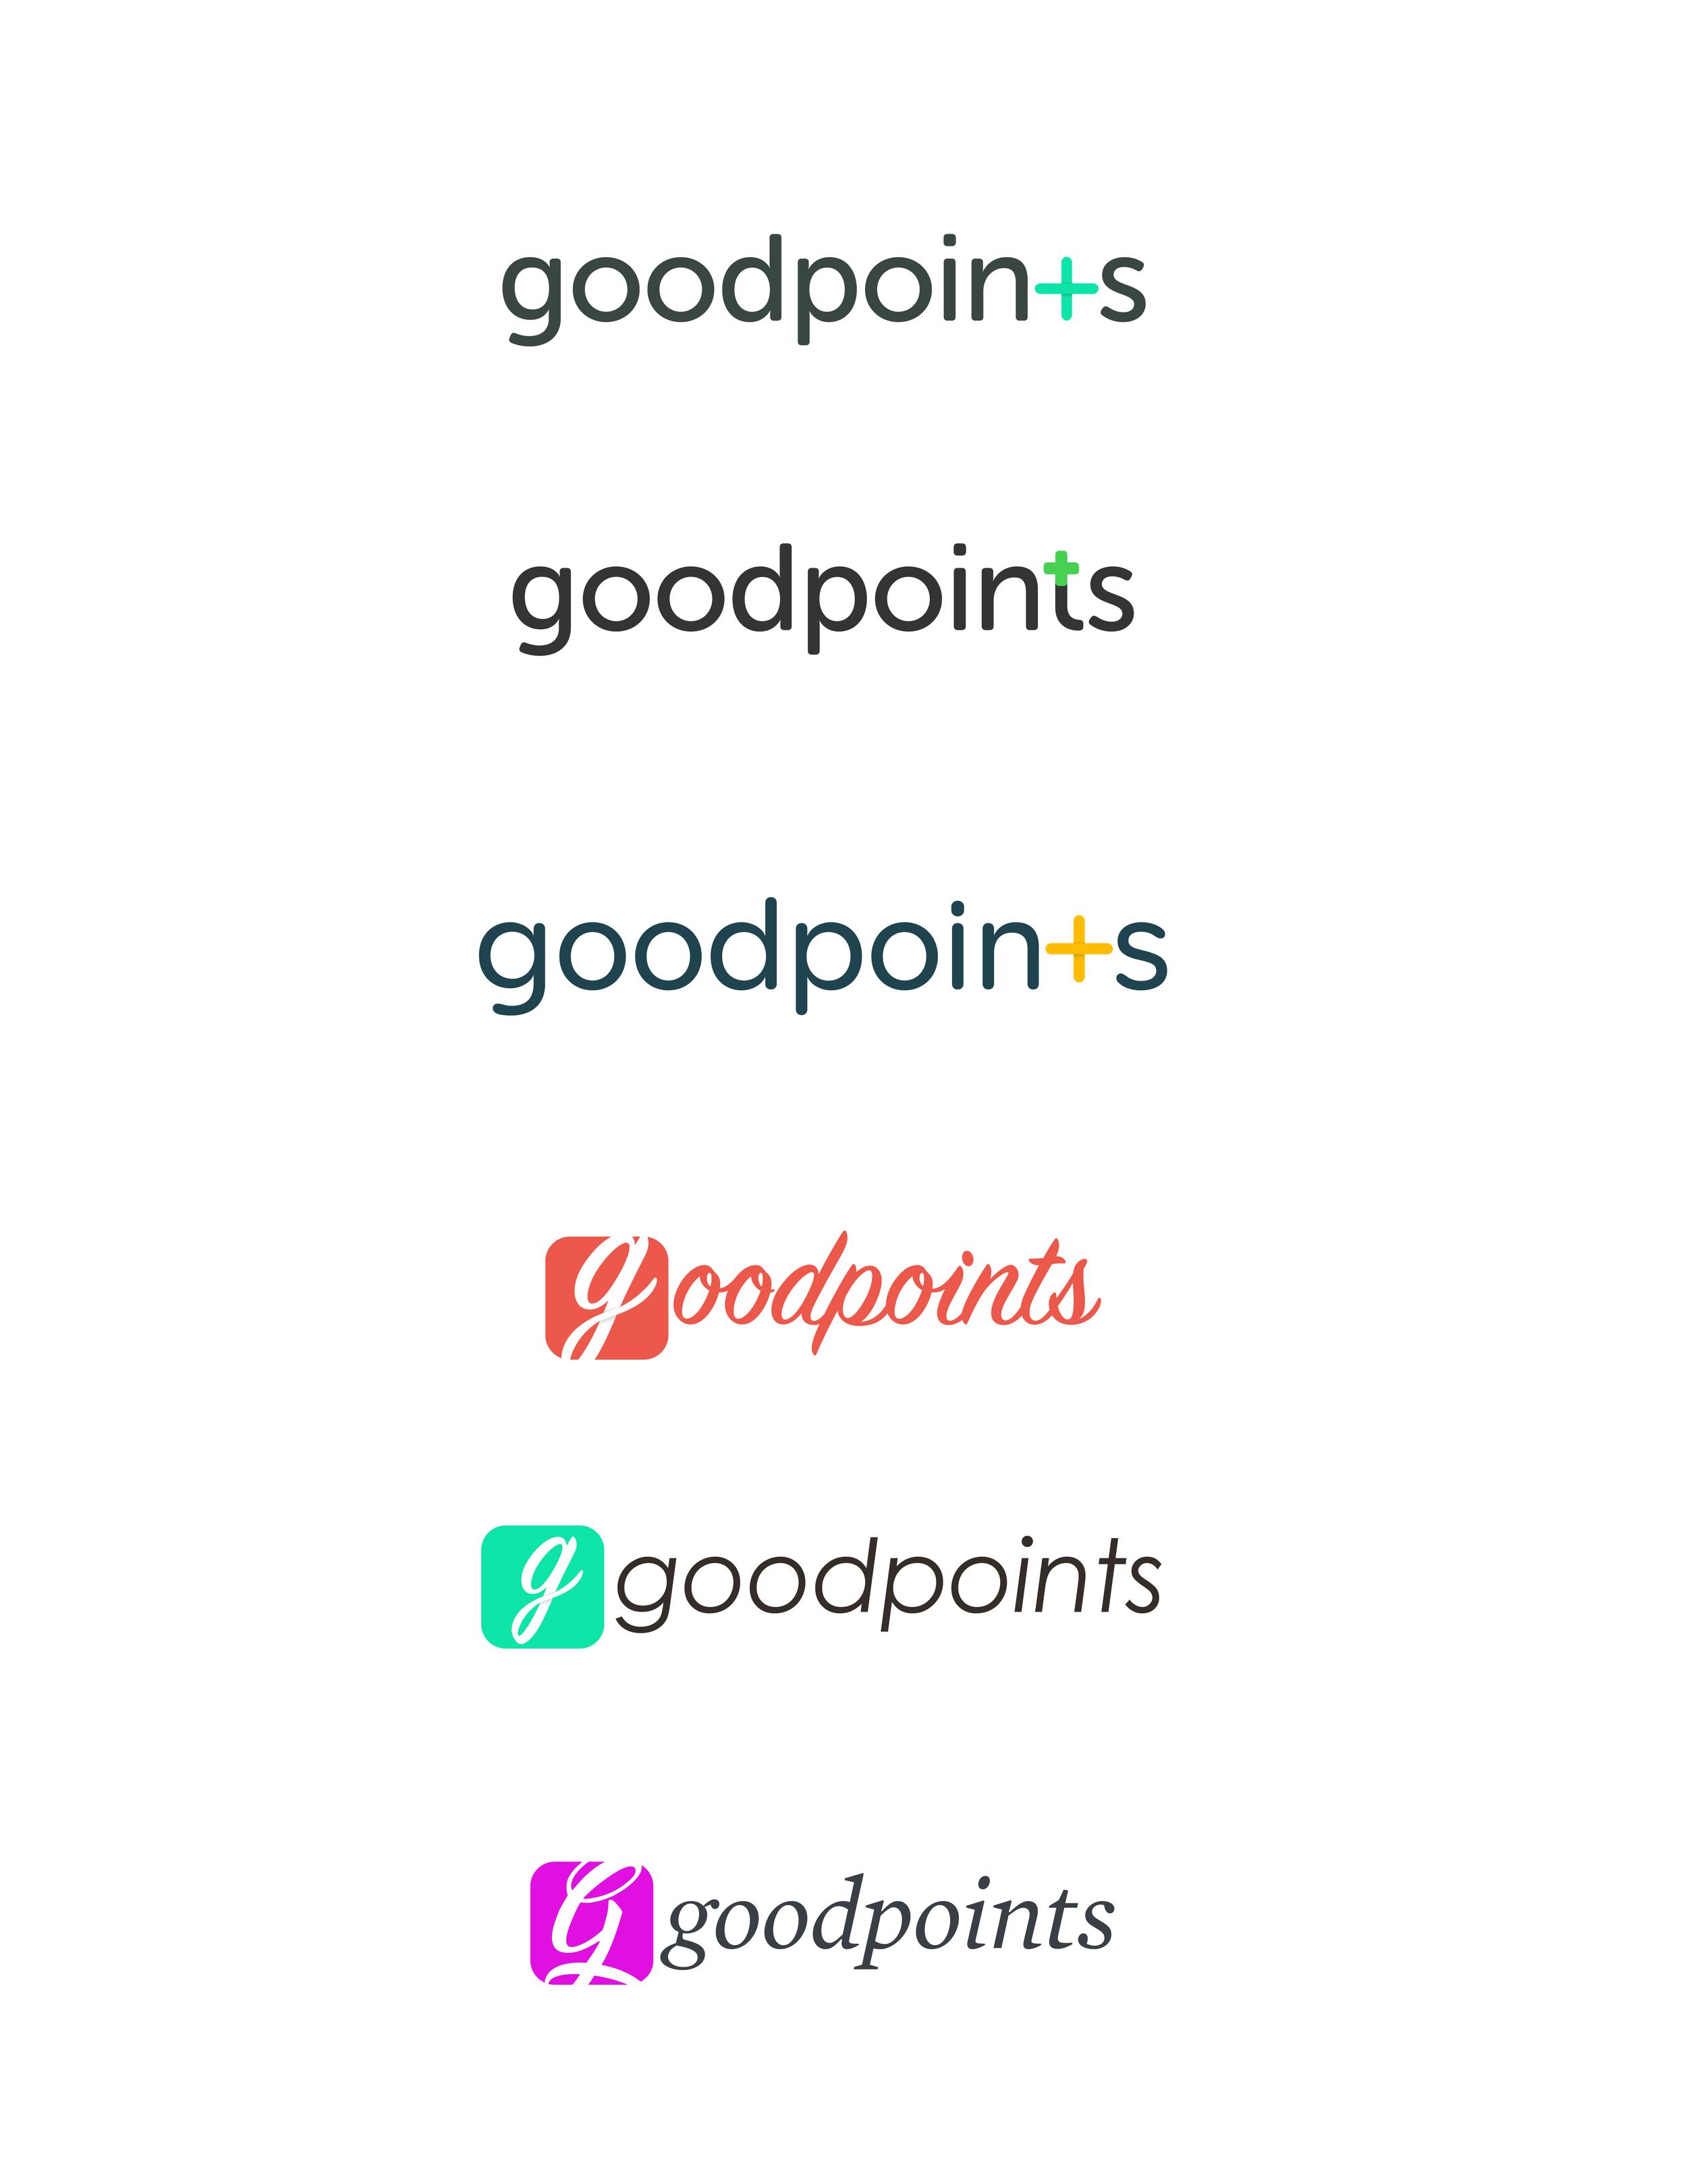 goodpoints_branding-05.png